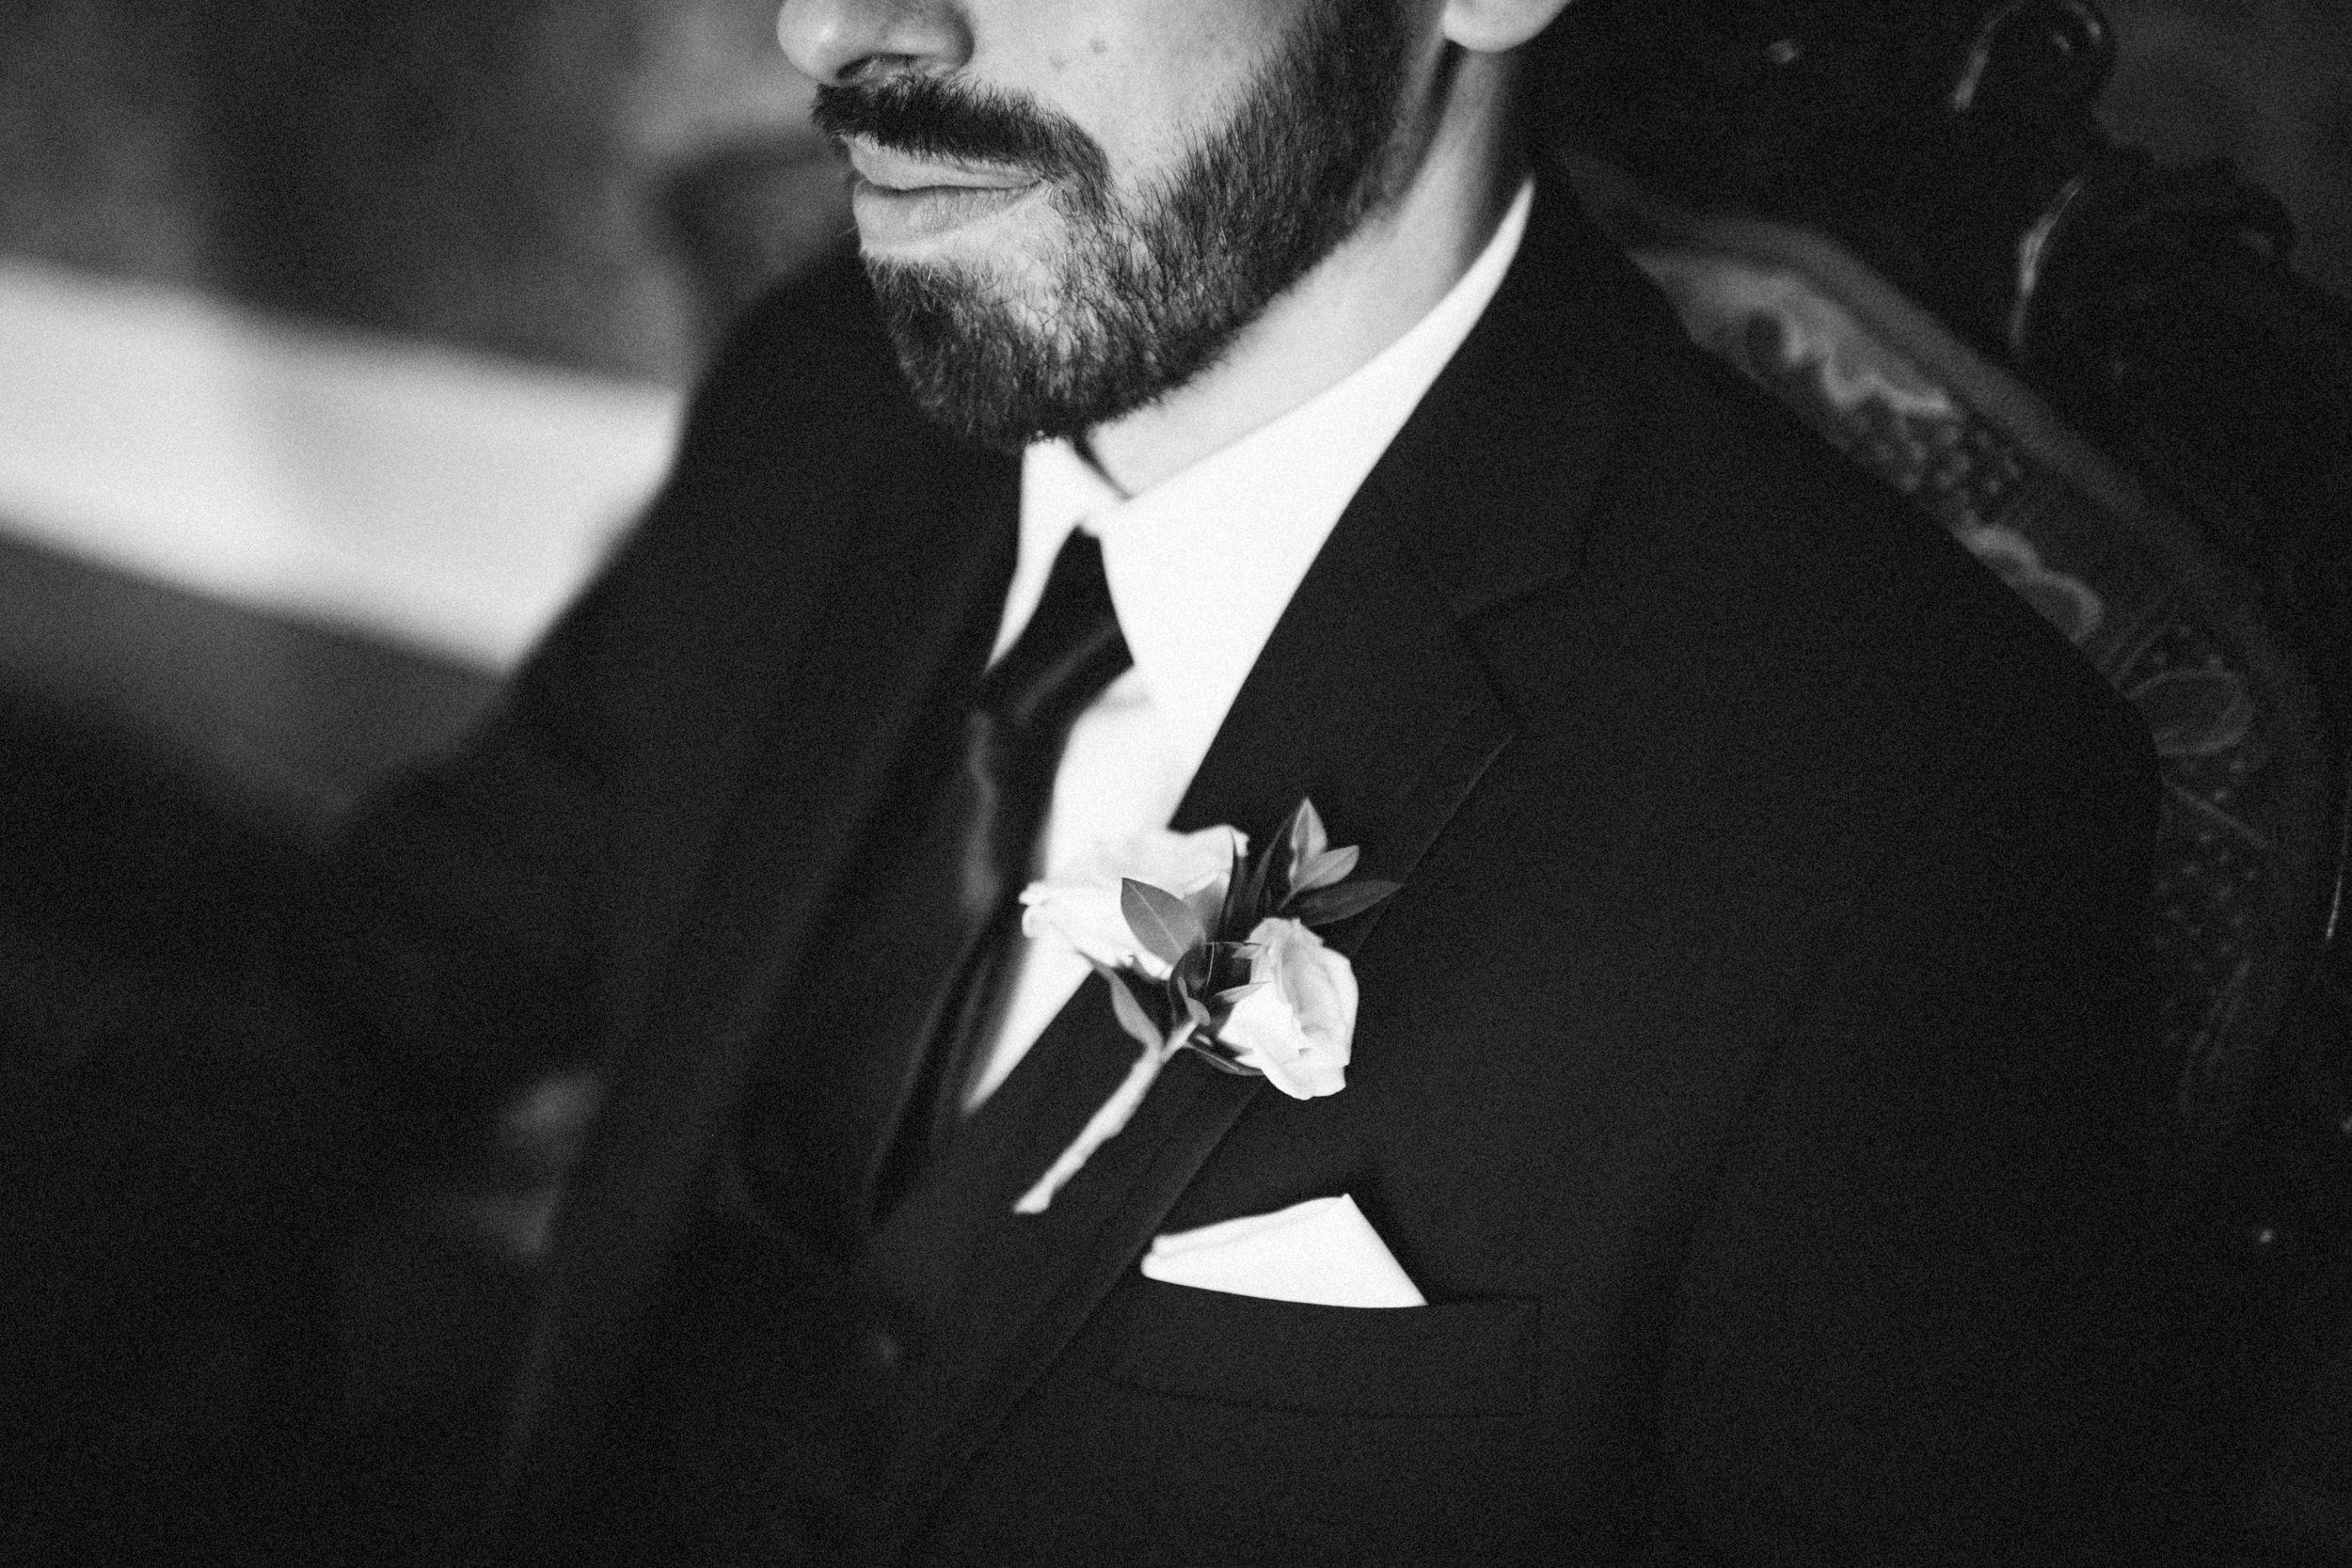 Louisville-Kentucky-Wedding-Elopement-Photographer-Sarah-Katherine-Davis-Photography-Whitehall-Classic-Timeless-Garden-Wedding-101.jpg